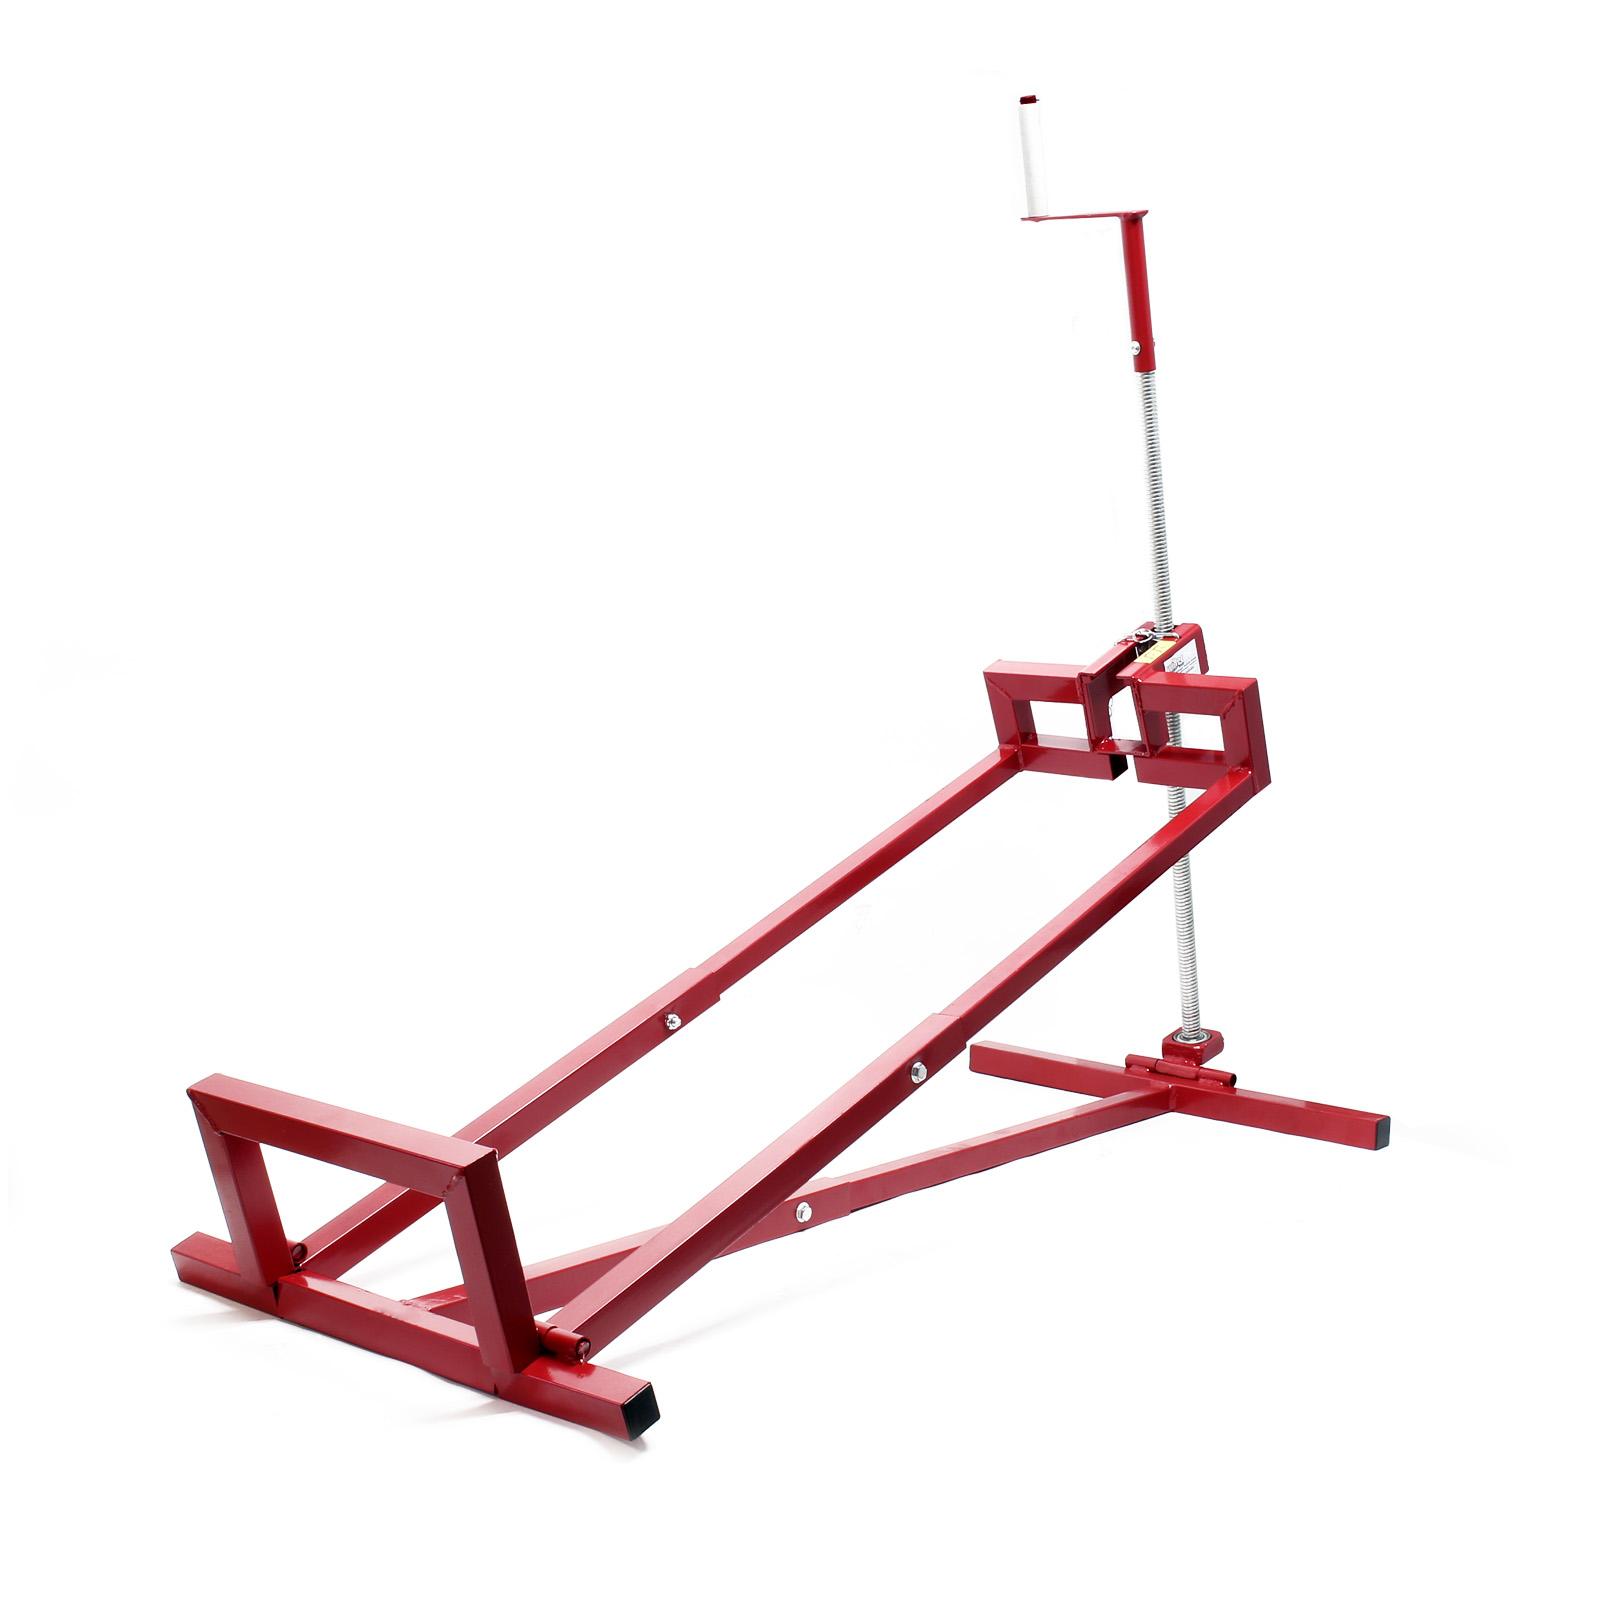 lawn mower lifter 400kg lifting device ramp ride on mower garden tractor jack ebay. Black Bedroom Furniture Sets. Home Design Ideas